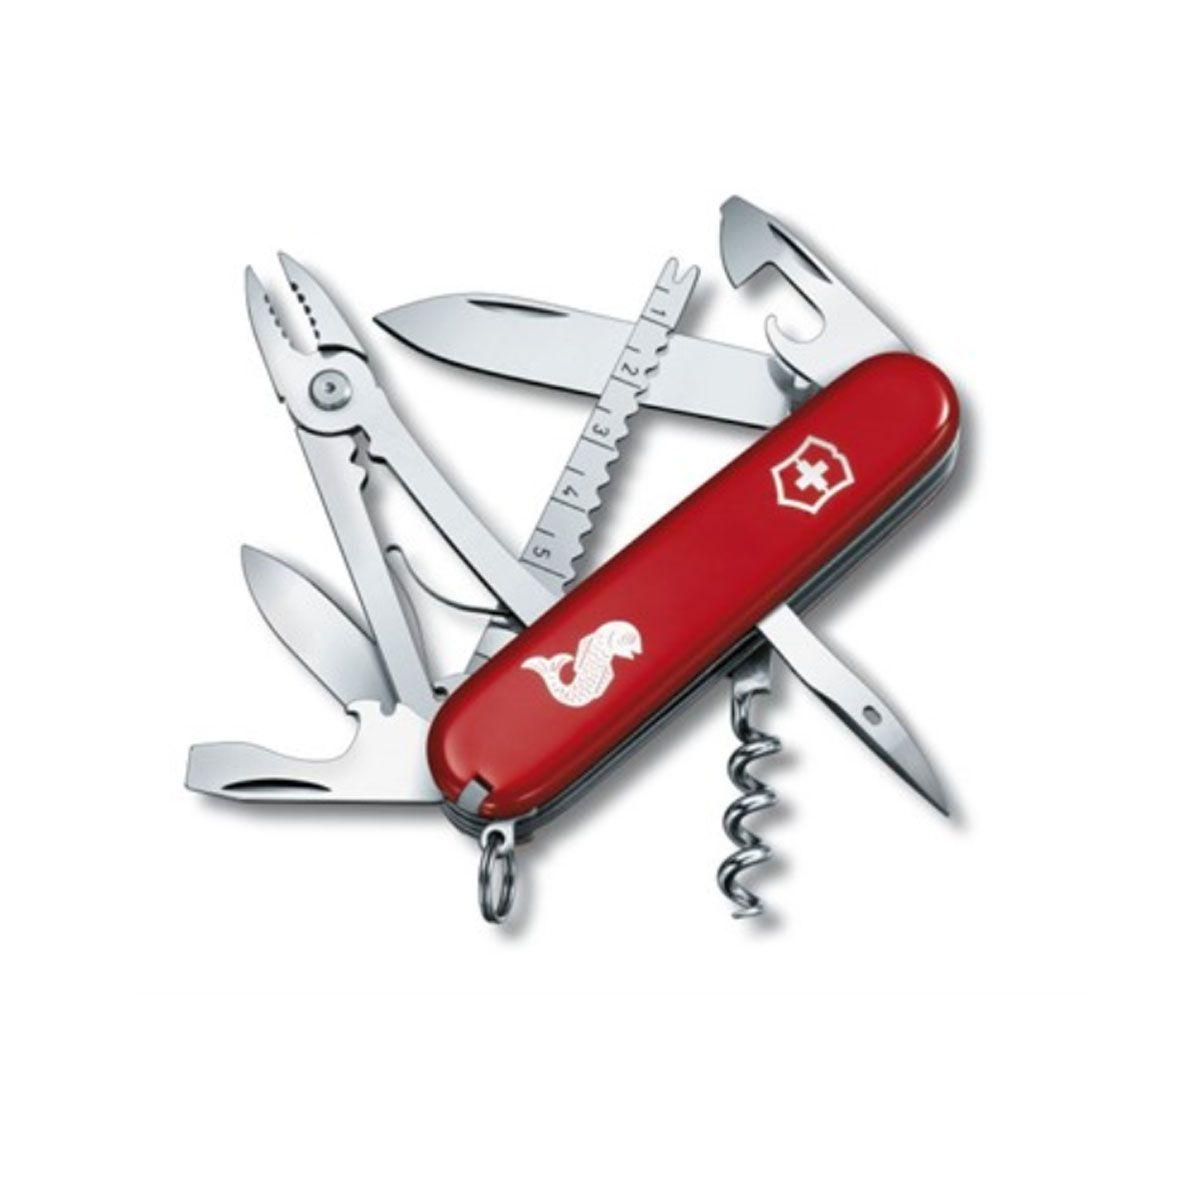 Canivete Victorinox Angler Vermelho